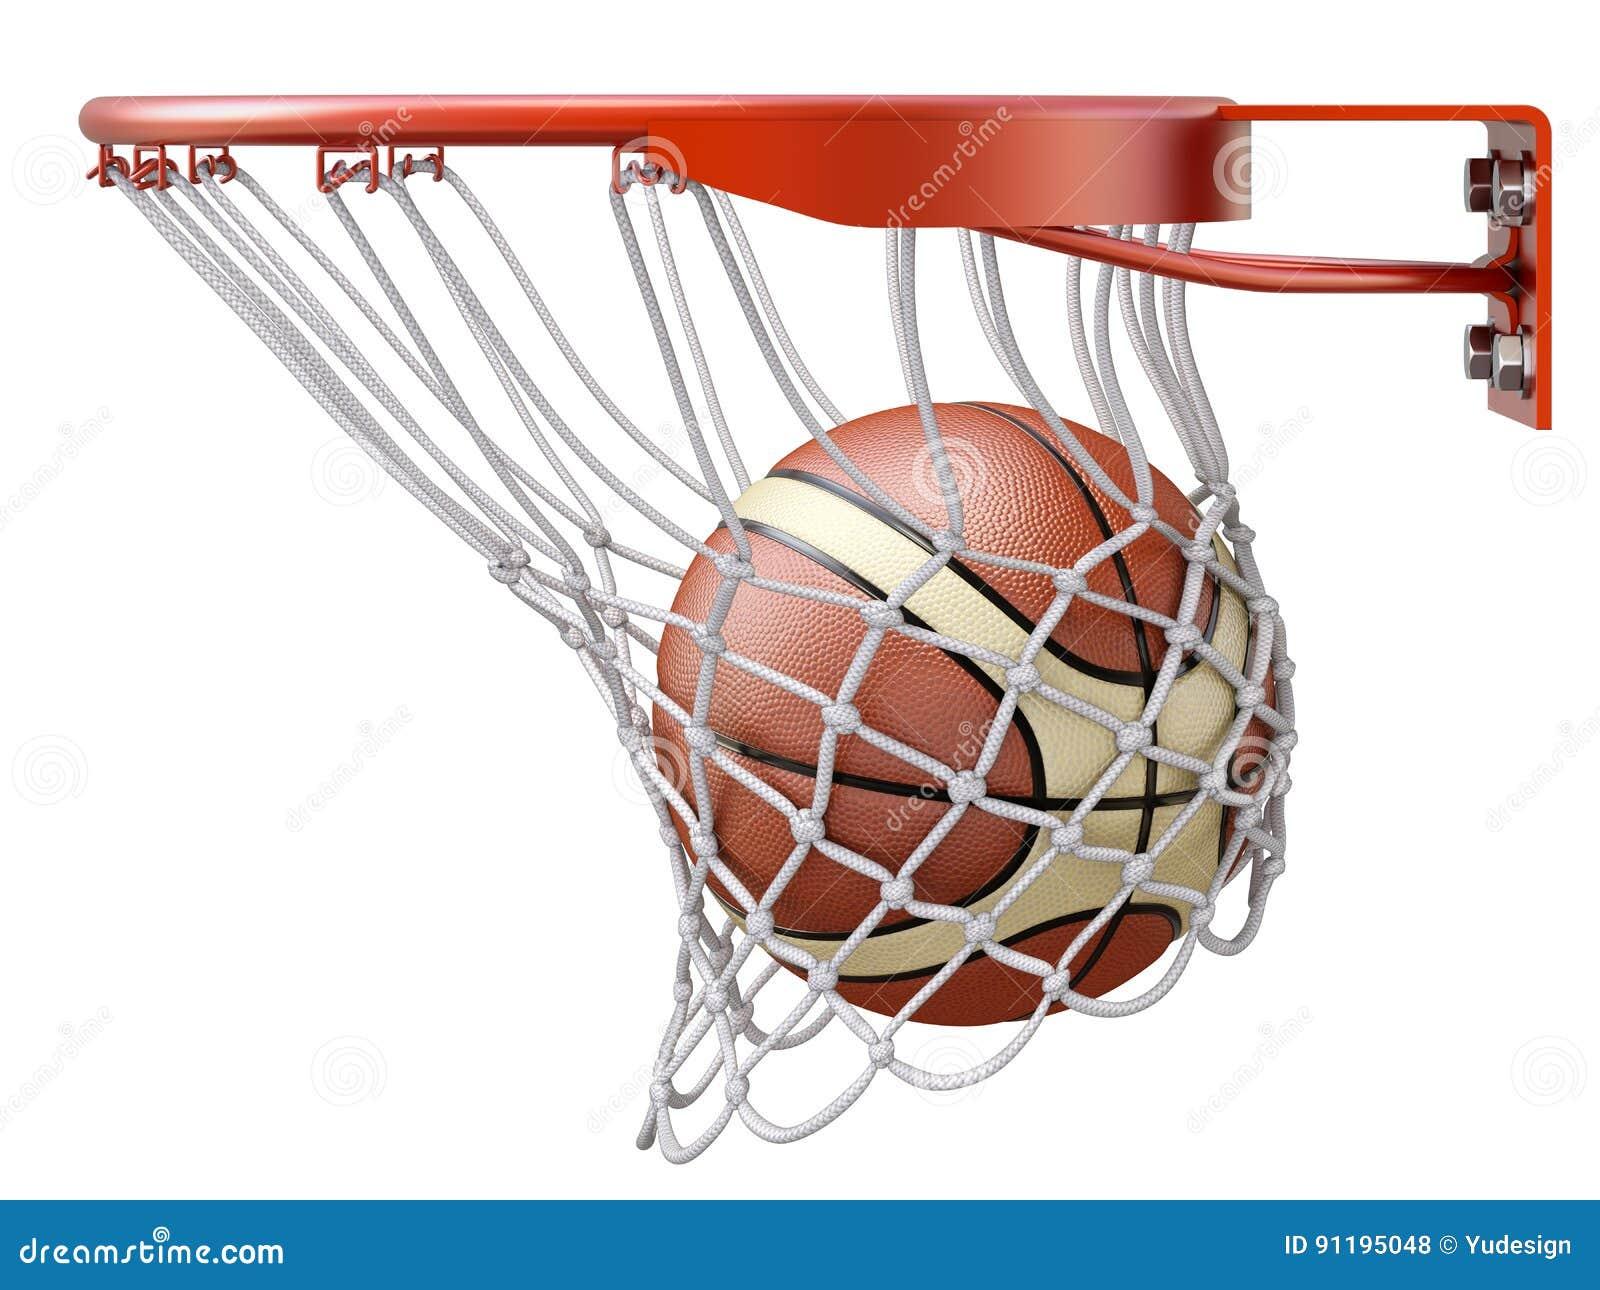 basketball going into the basket hoop stock illustration